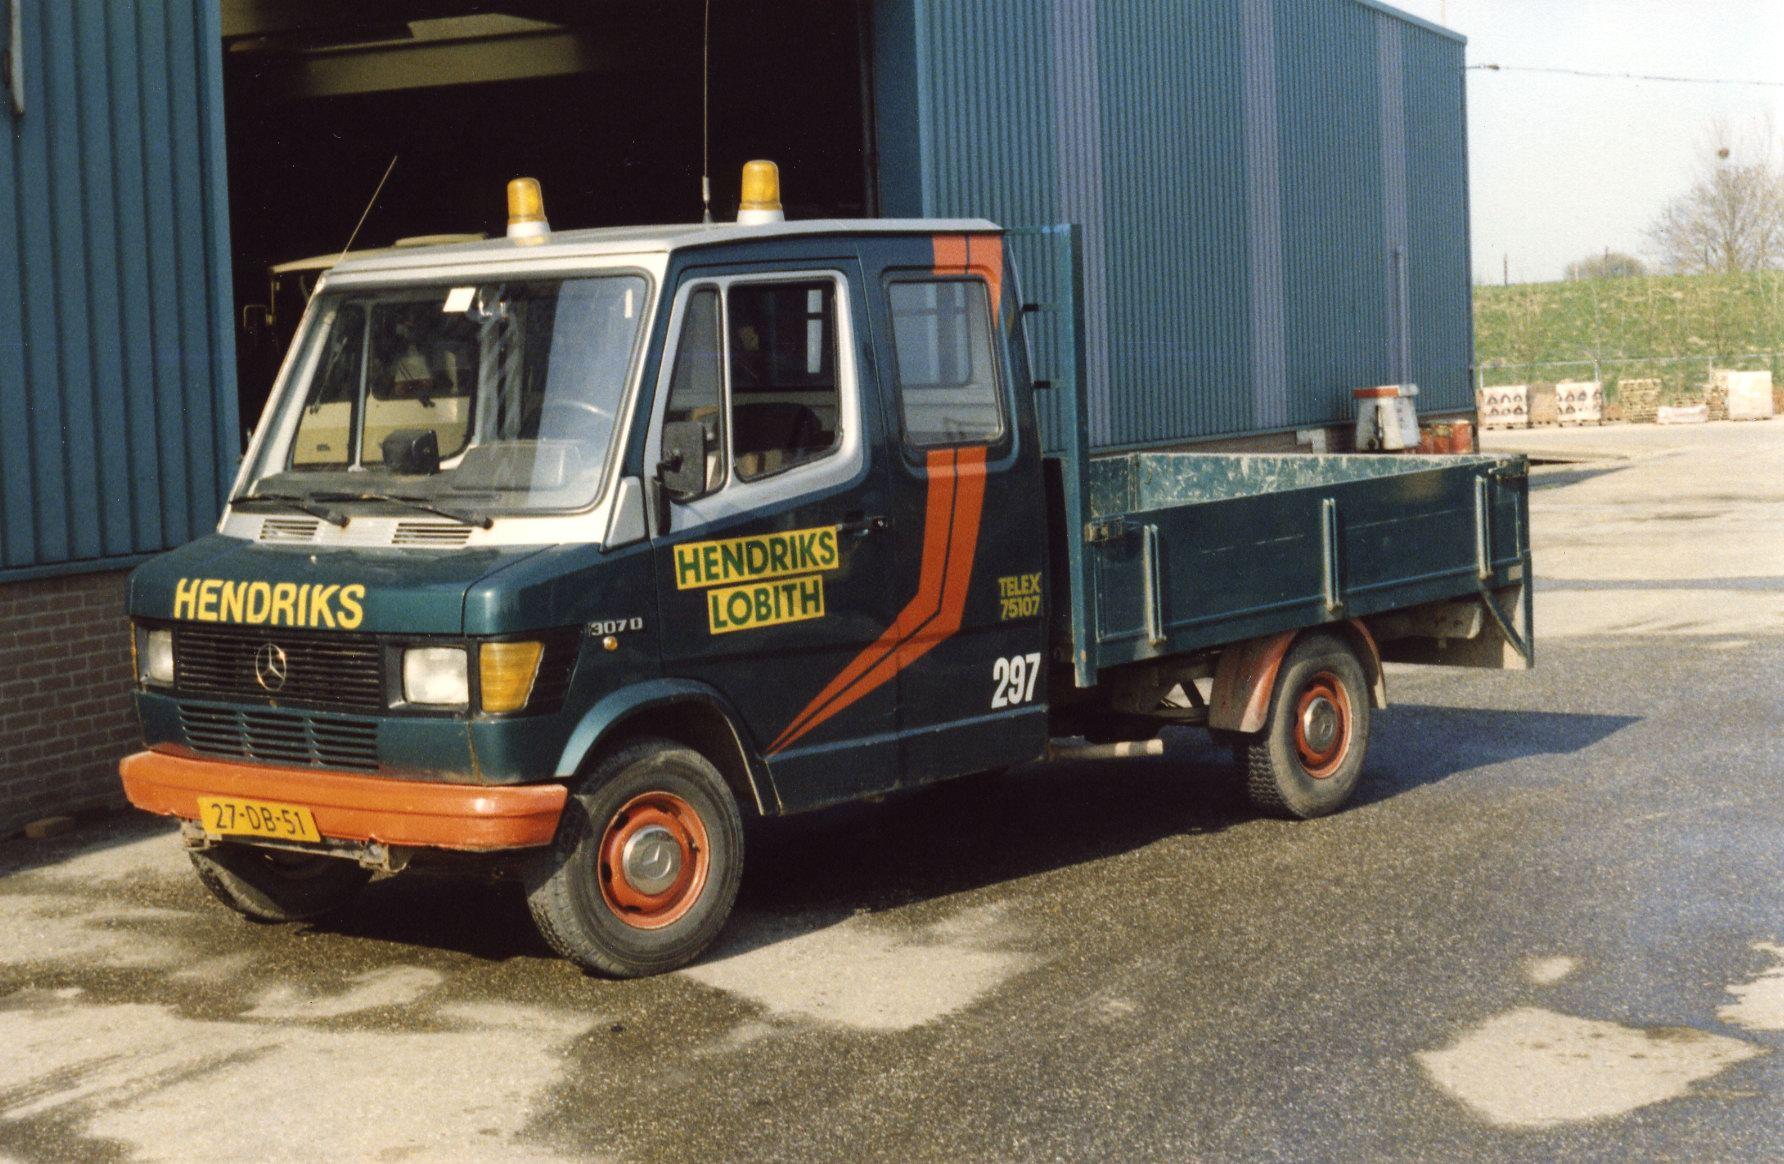 Hendriks-Lobith-Mercedes-307D-27DB51